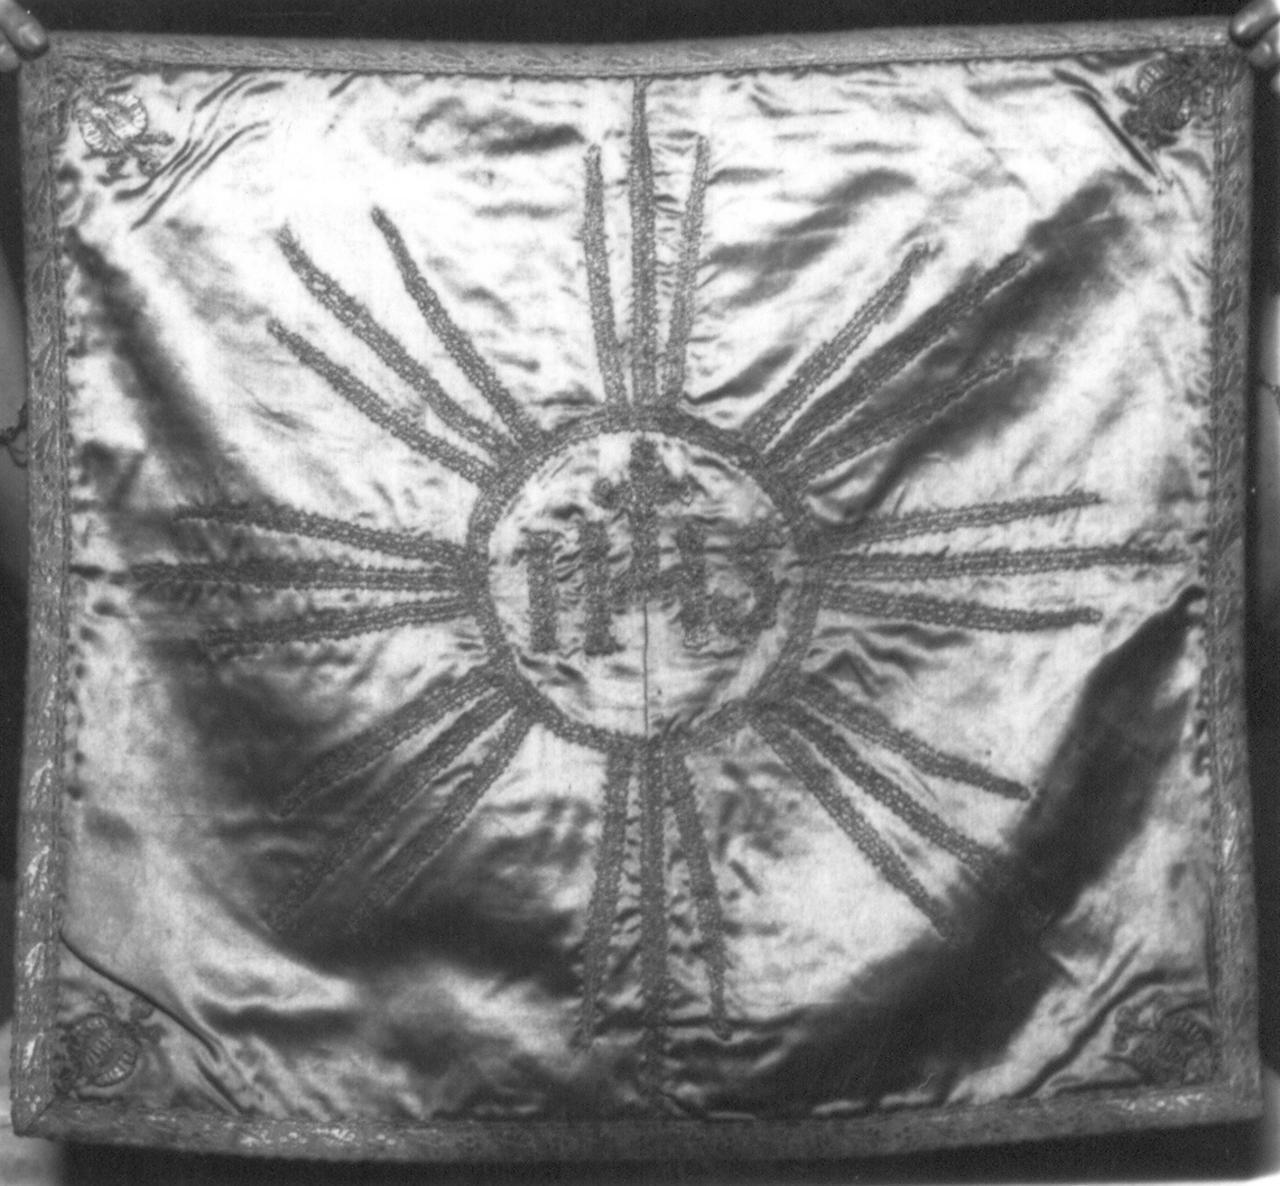 velo di calice - manifattura italiana (sec. XIX)